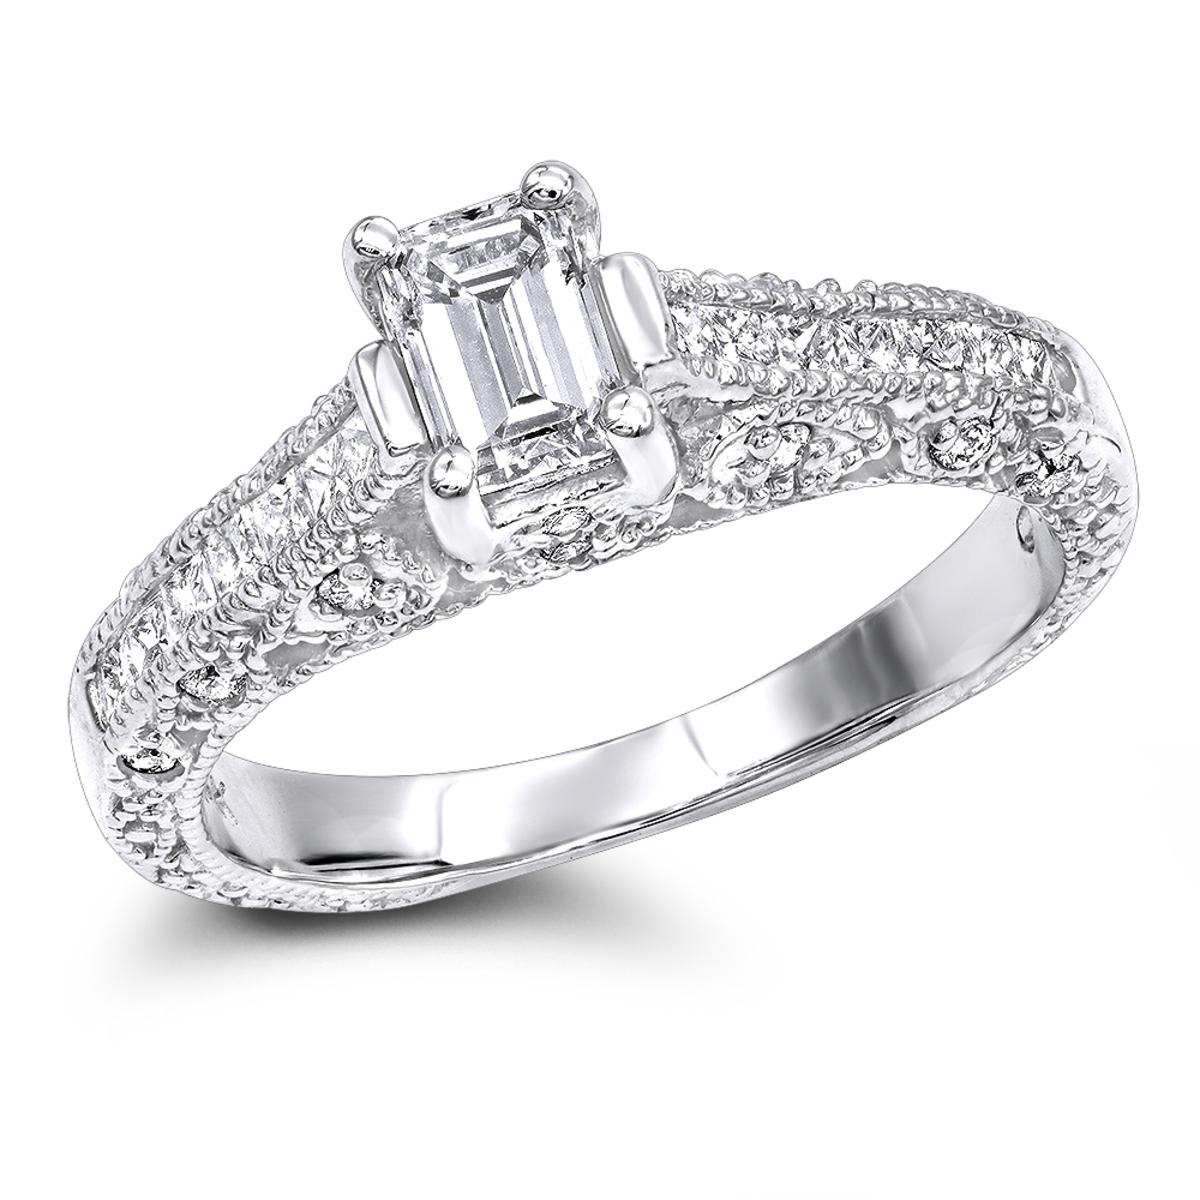 14K Gold Diamond Unique Engagement Ring 1.08ct